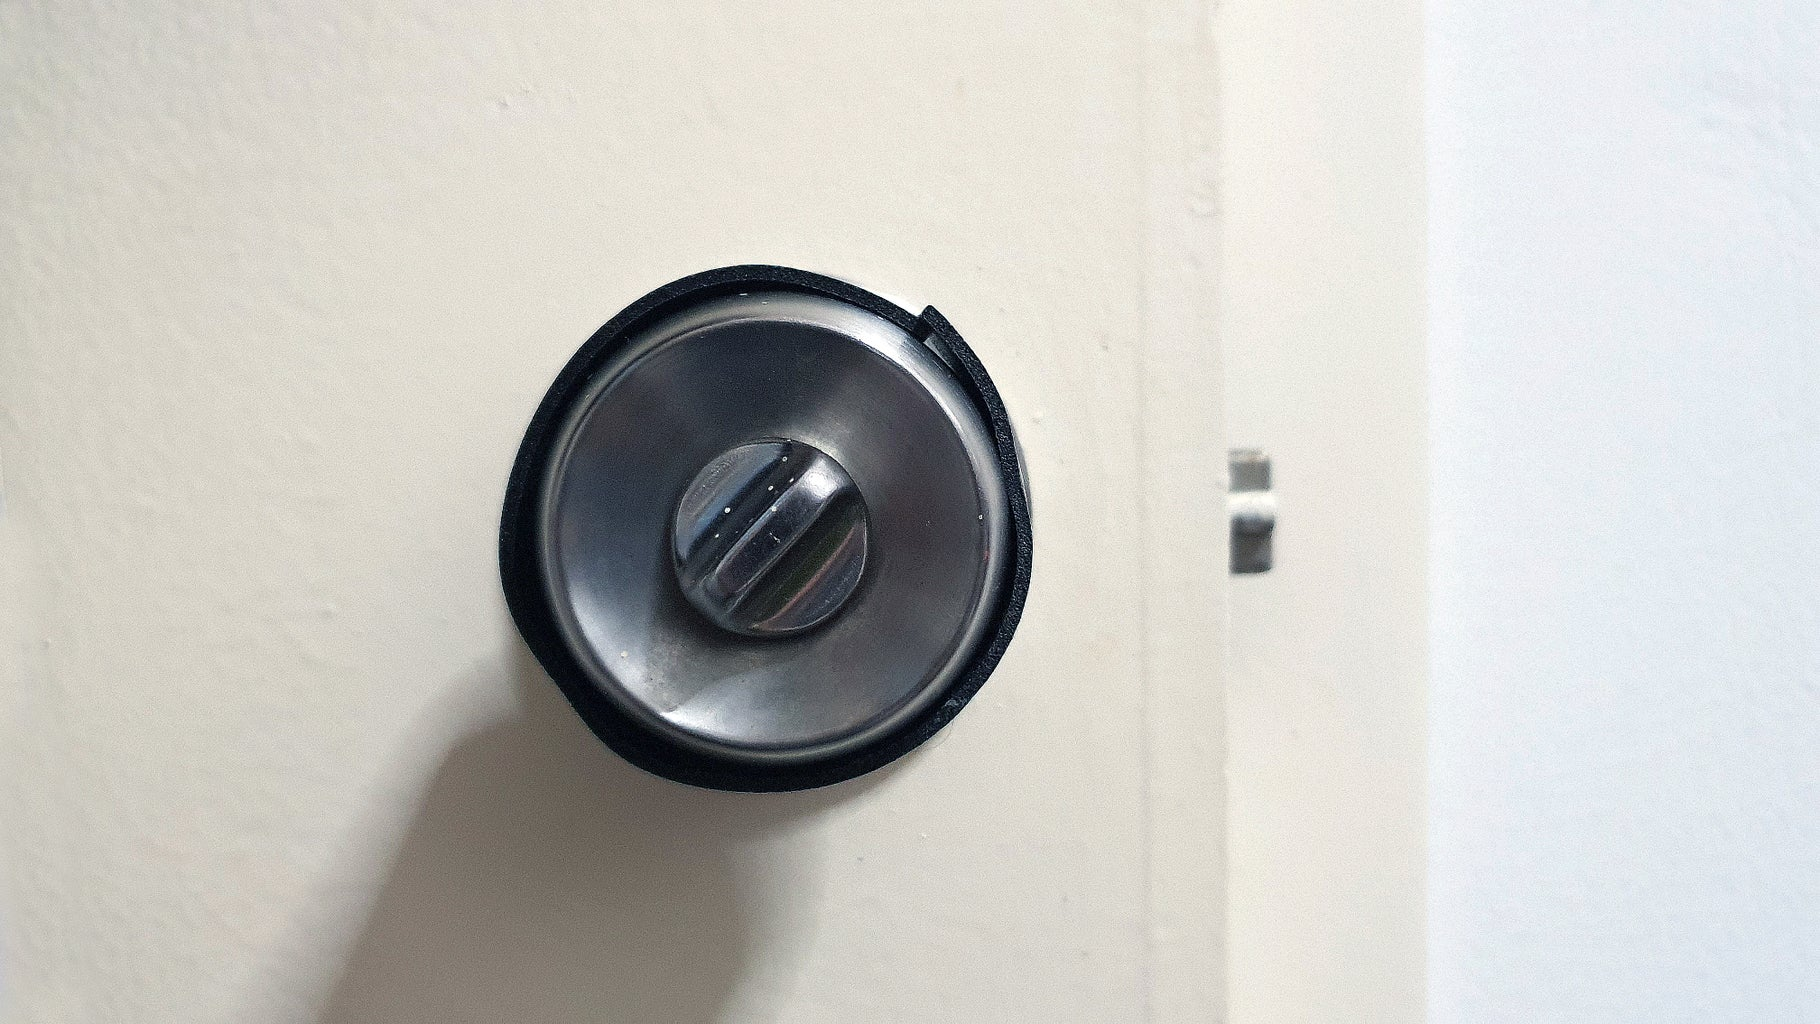 Wrap the Anti-slip Foam Around Your Door Knob